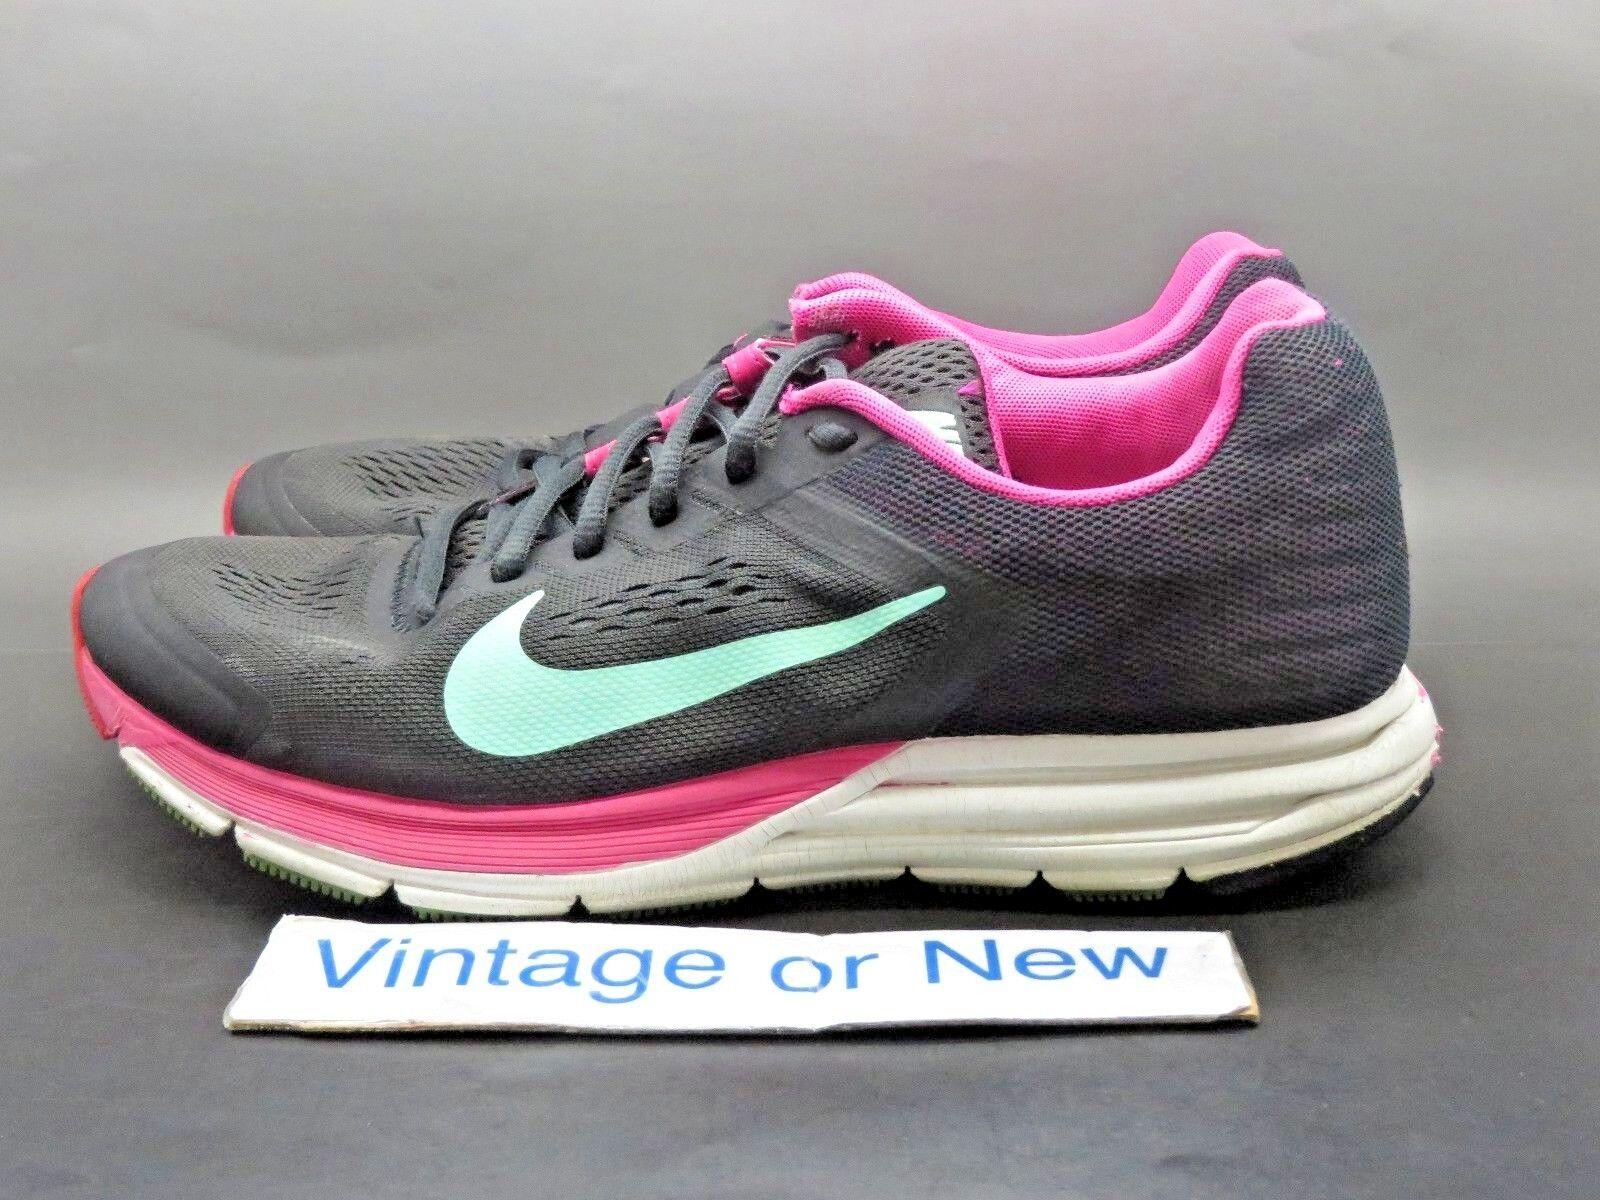 ce7ad93d71334d ... Women s Nike Zoom Structure+ 17 Charcoal Pink Foil Running Running  Running 615588-036 sz 8.5 ...